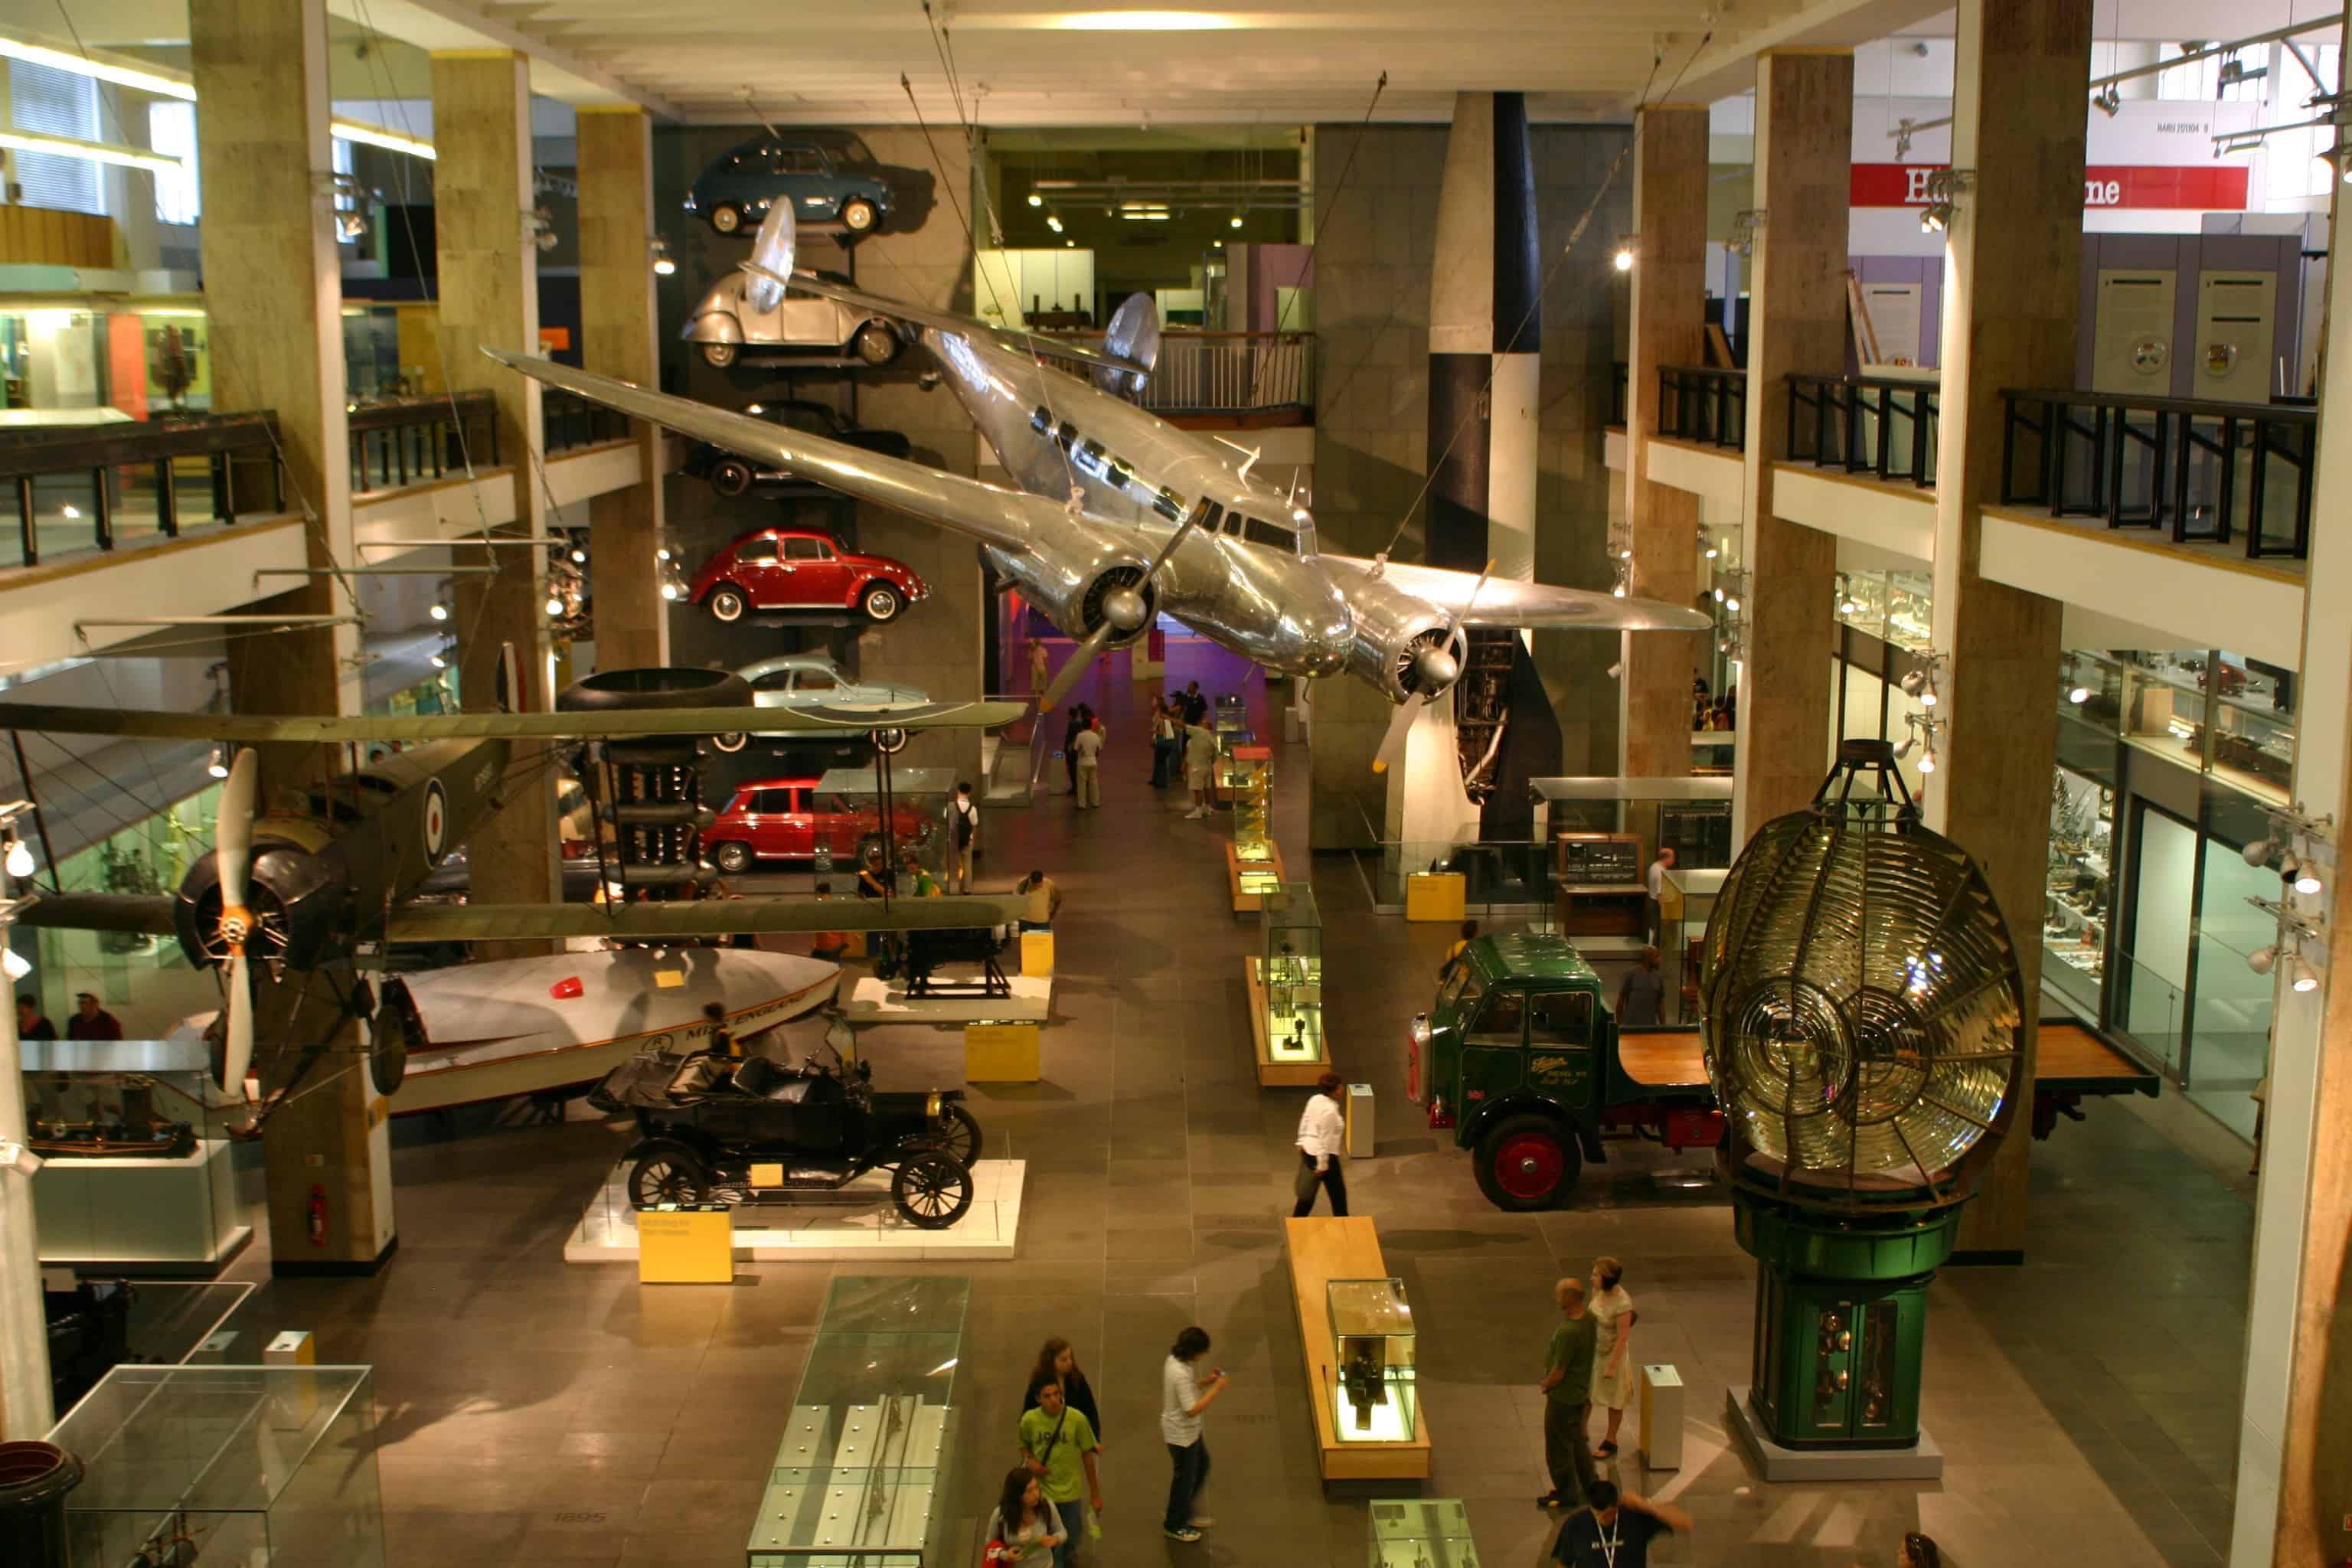 Science_museum_in_London